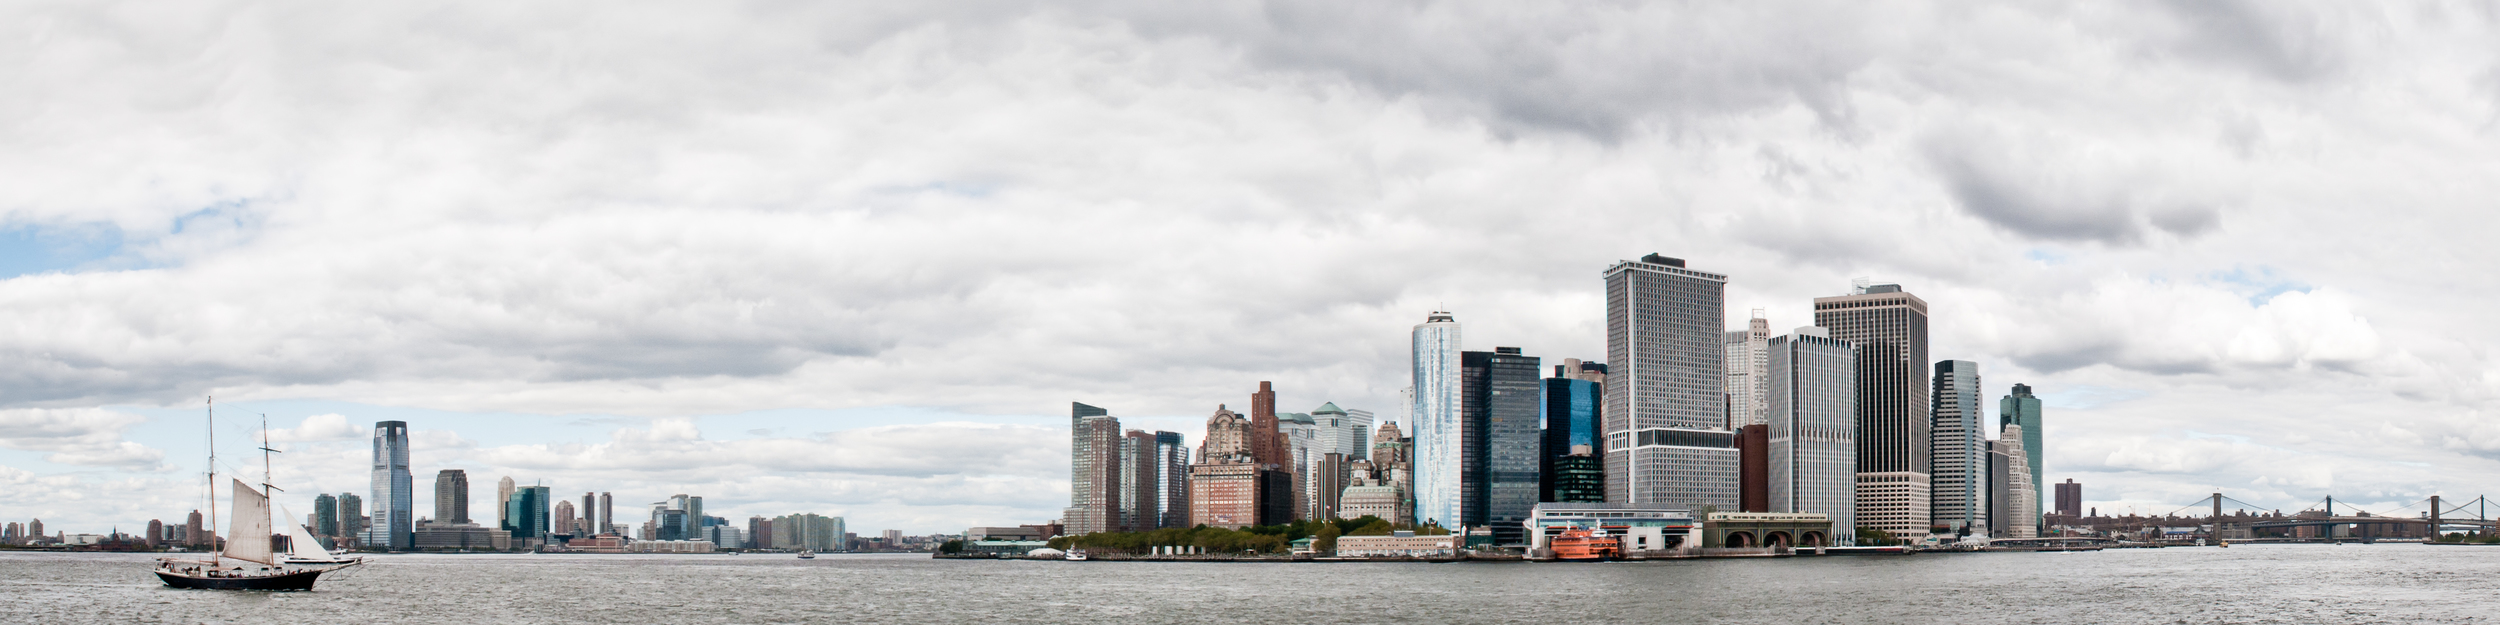 NYC Battery Pano-Final.jpg